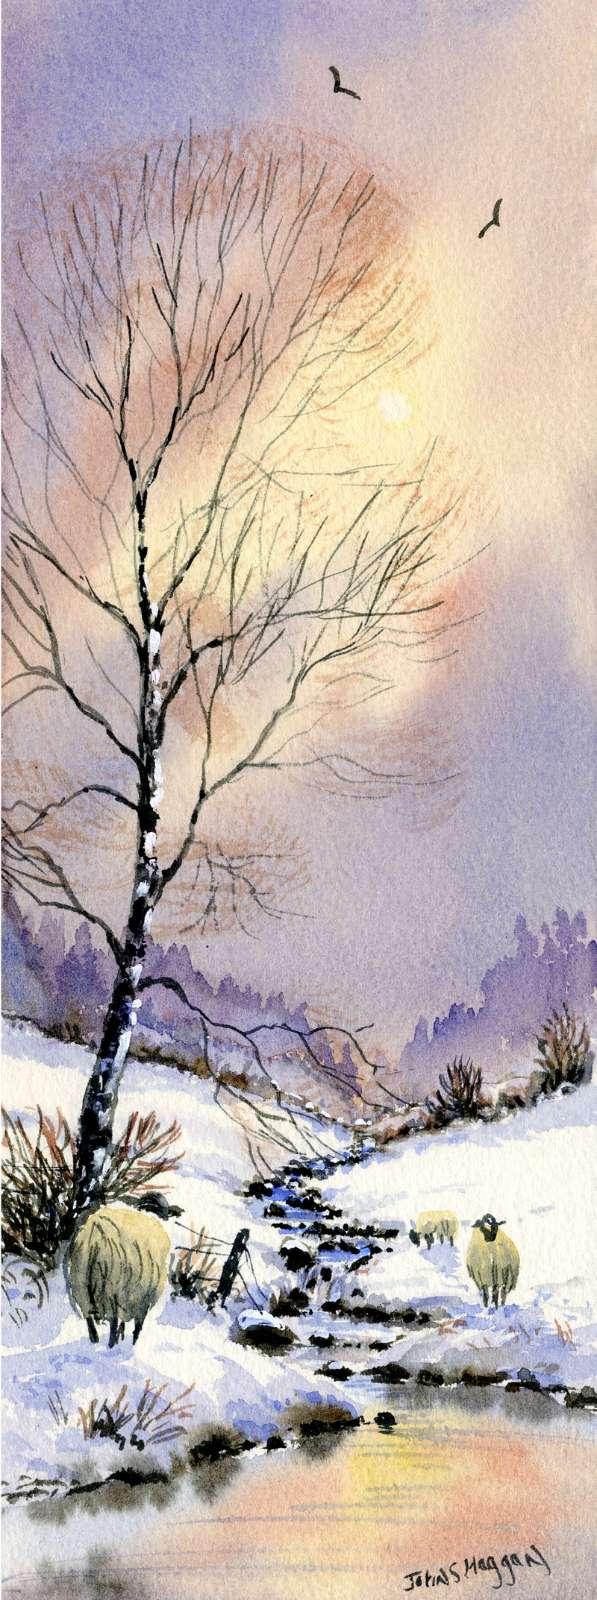 Early Snow Print (LNG015)